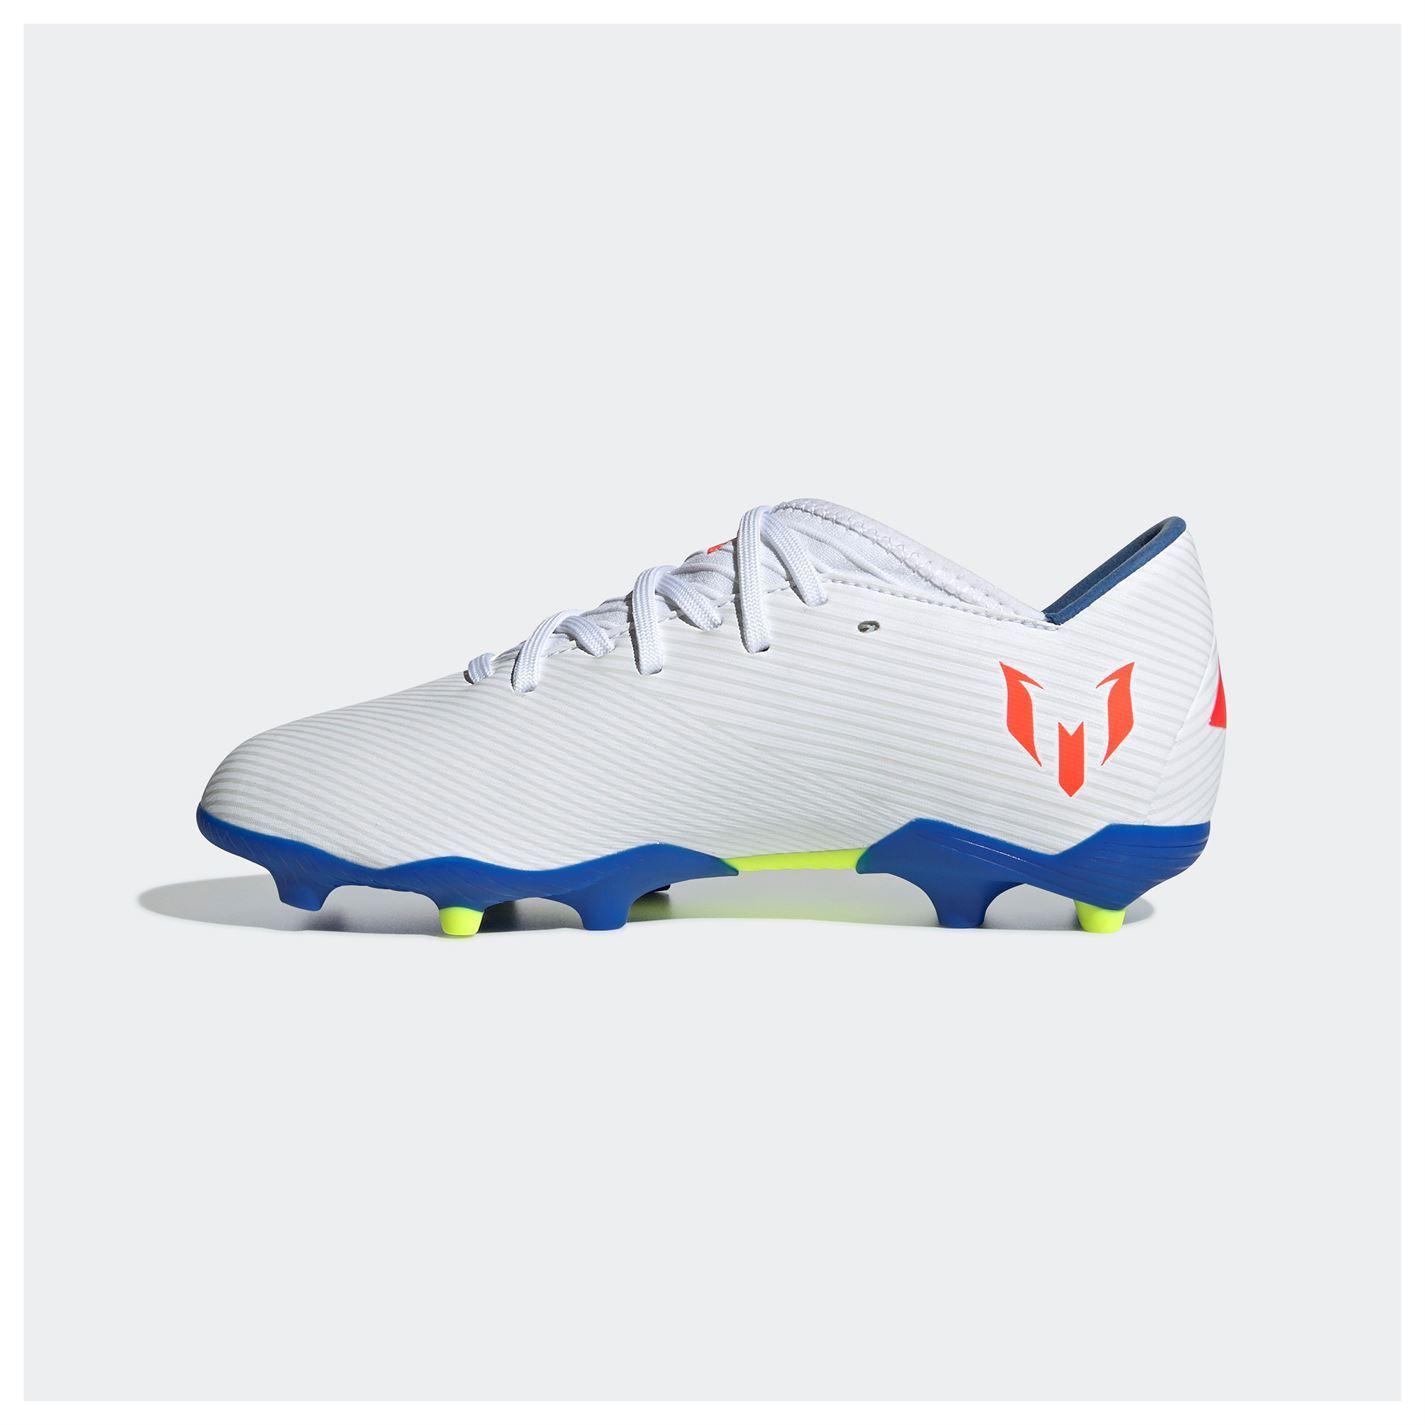 Adidas scarpe da calcio messi 15,3 fg junior whiteblue